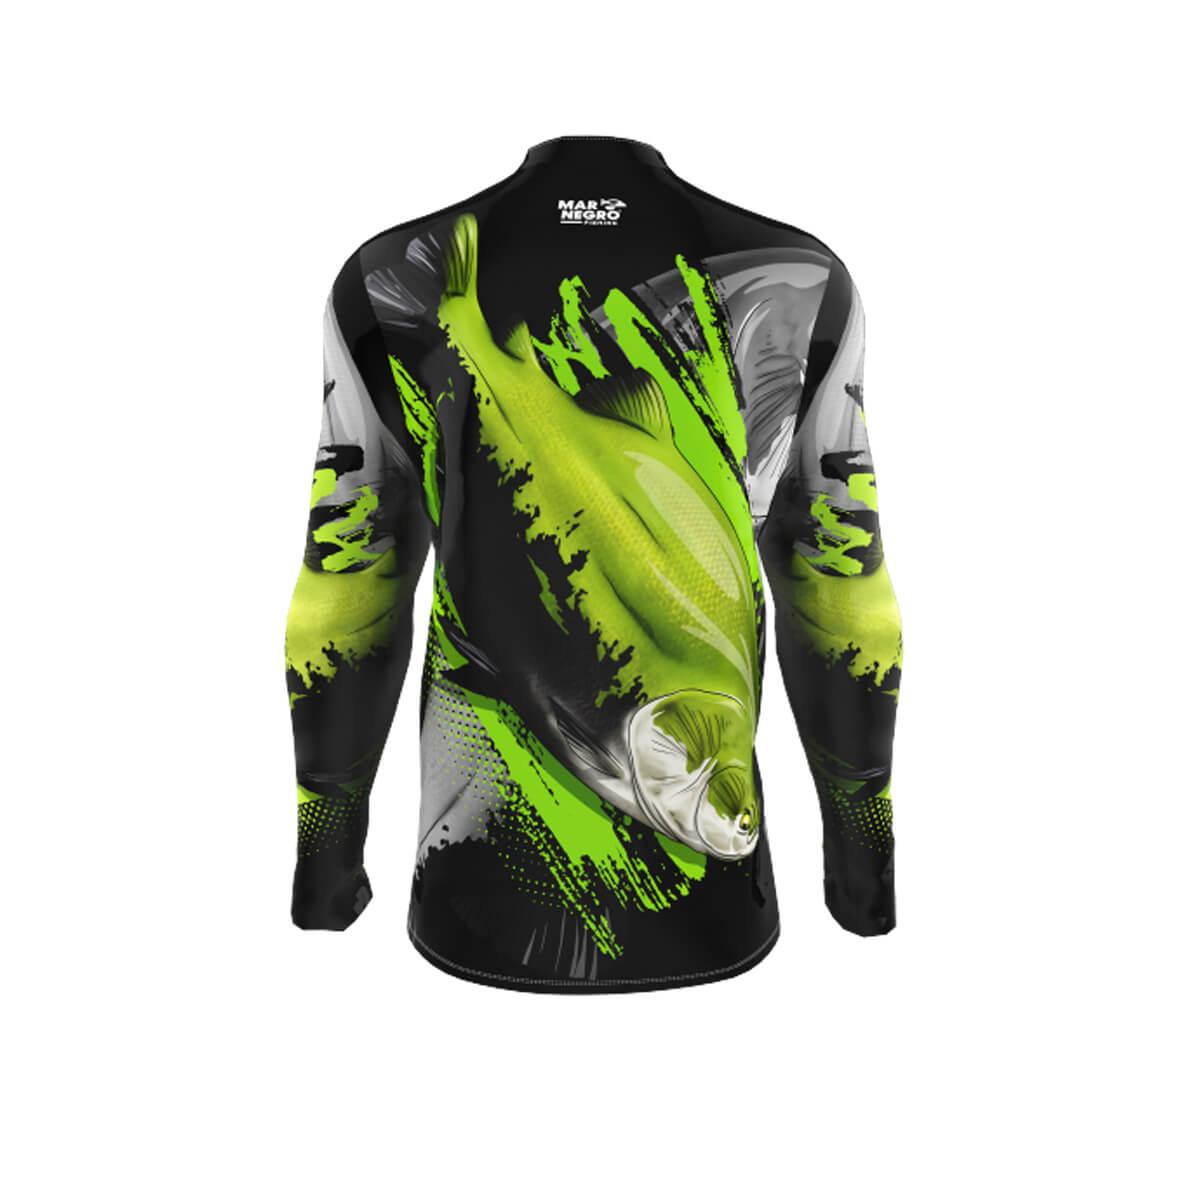 Camiseta Mar Negro 2021 Infantil Tambaqui  - Pró Pesca Shop